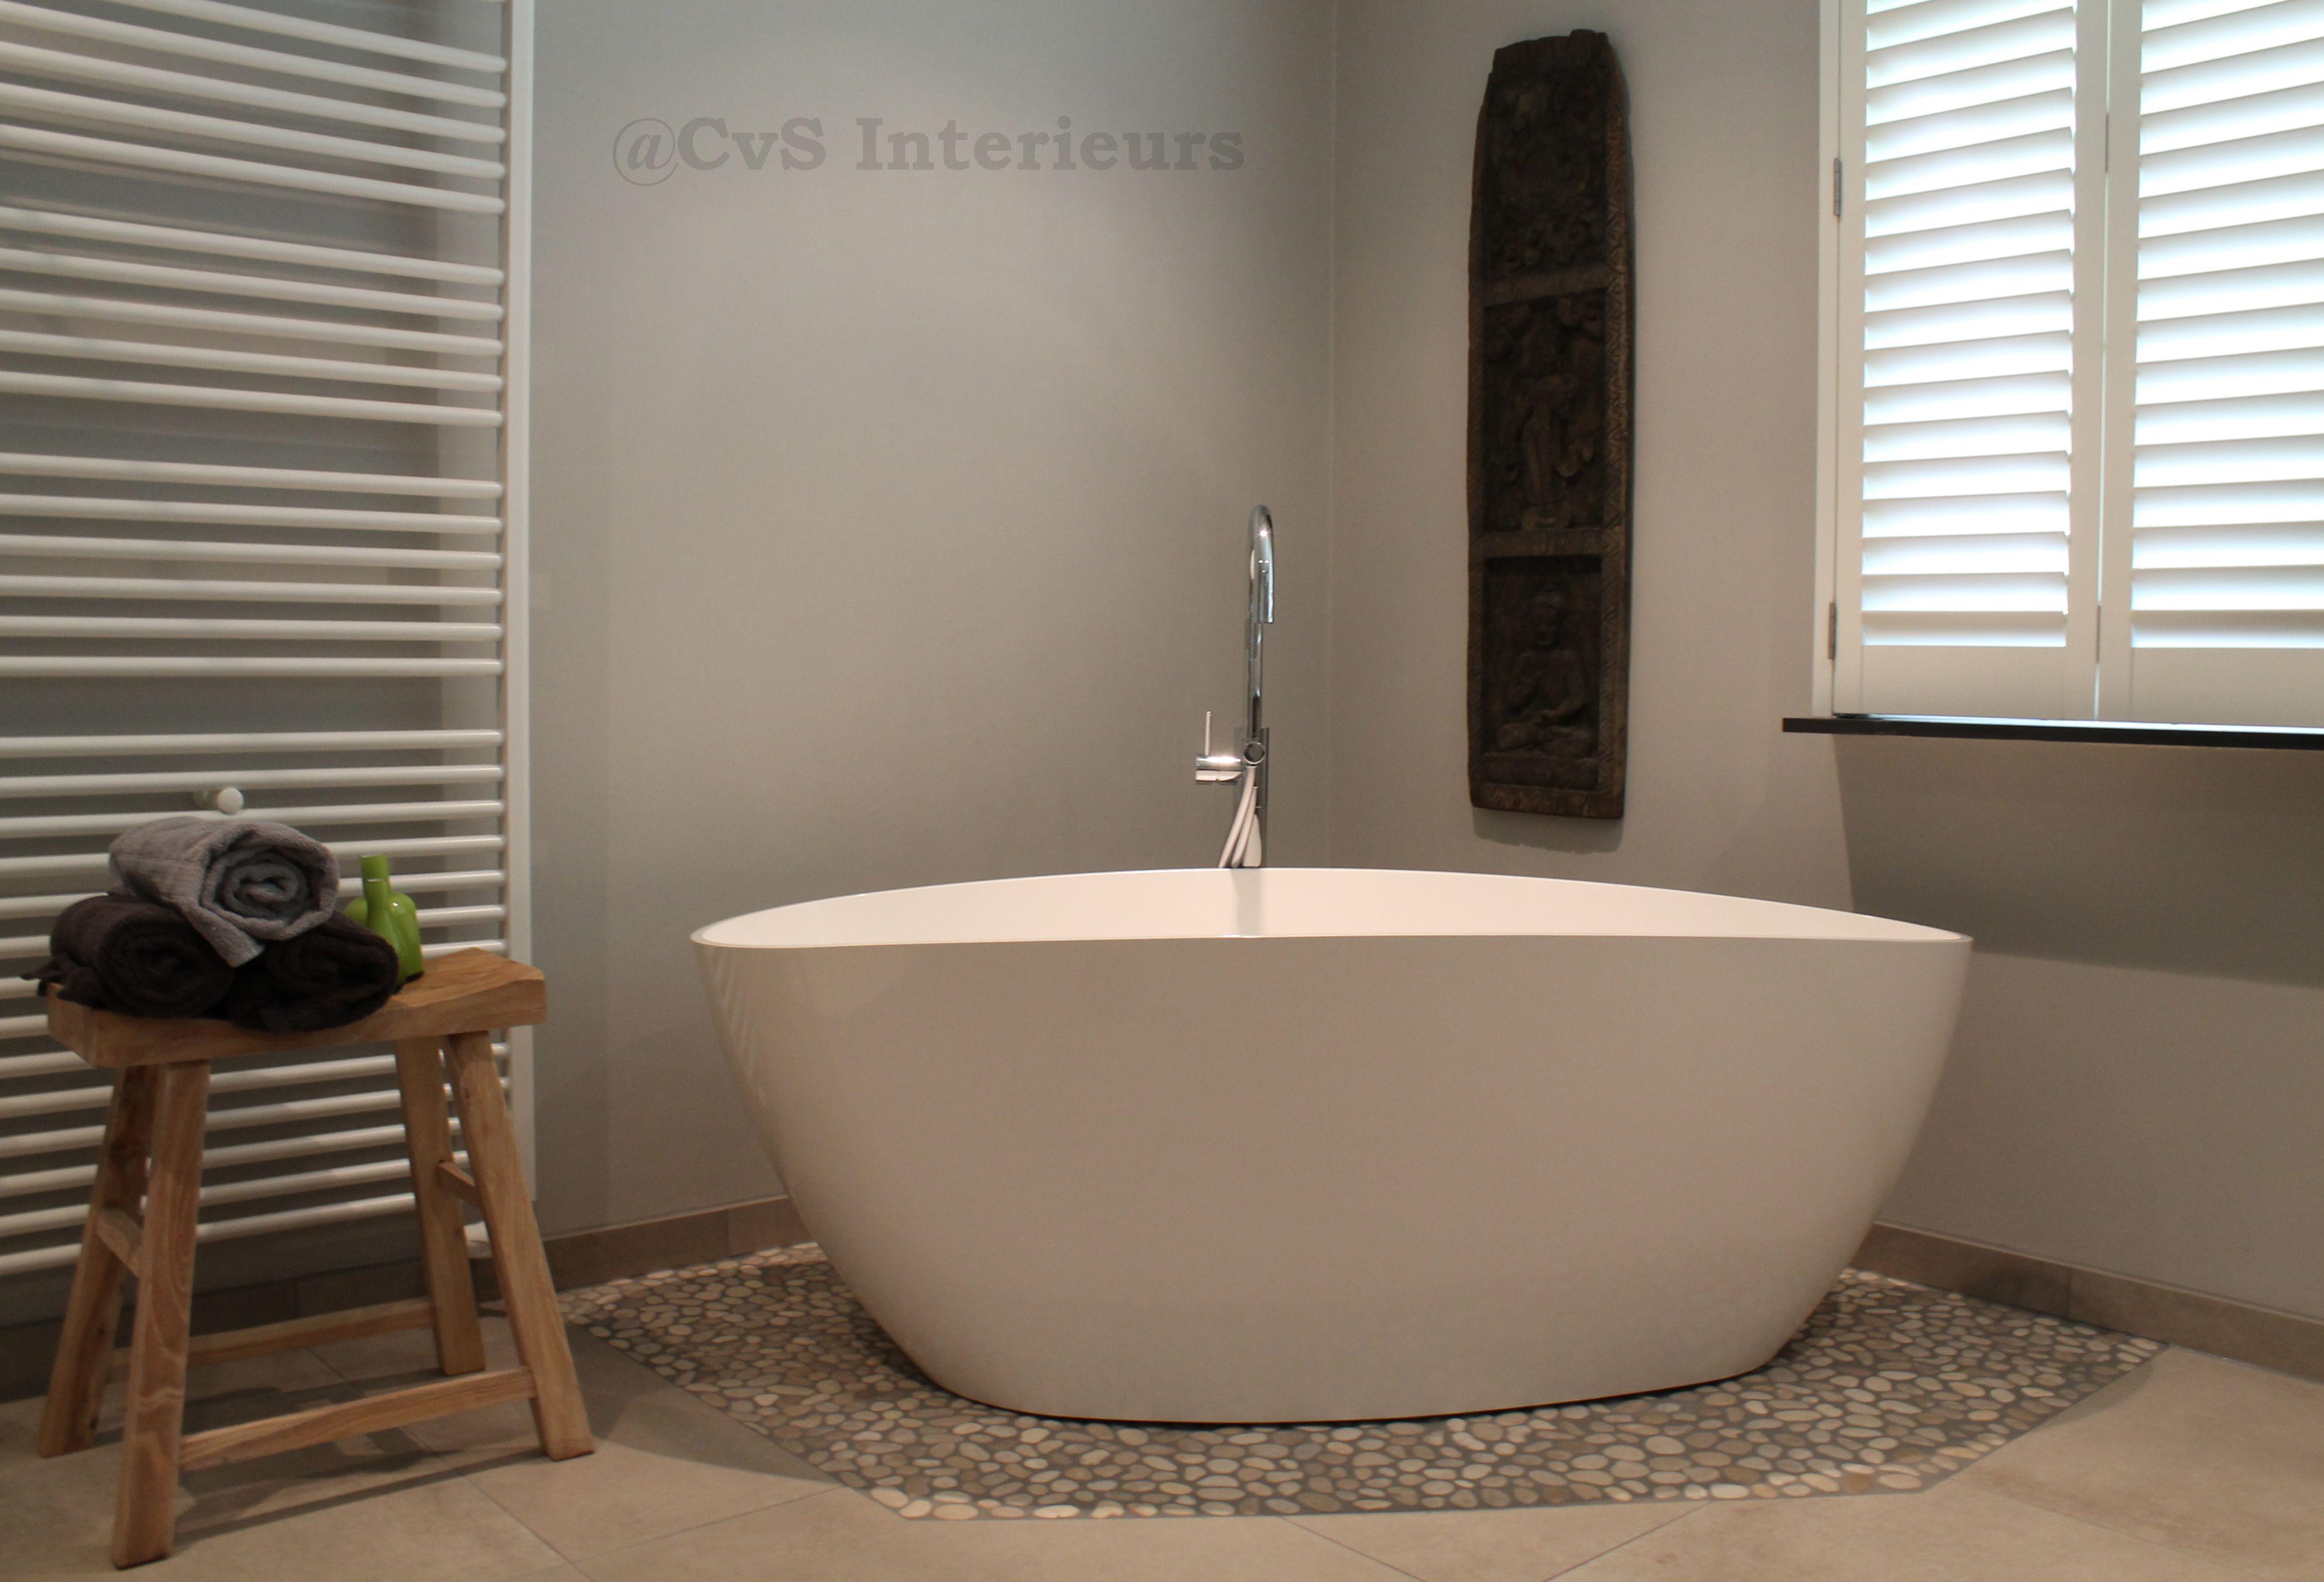 Strak Landelijke Badkamer : Strak landelijke badkamer colette van schilt interieurs